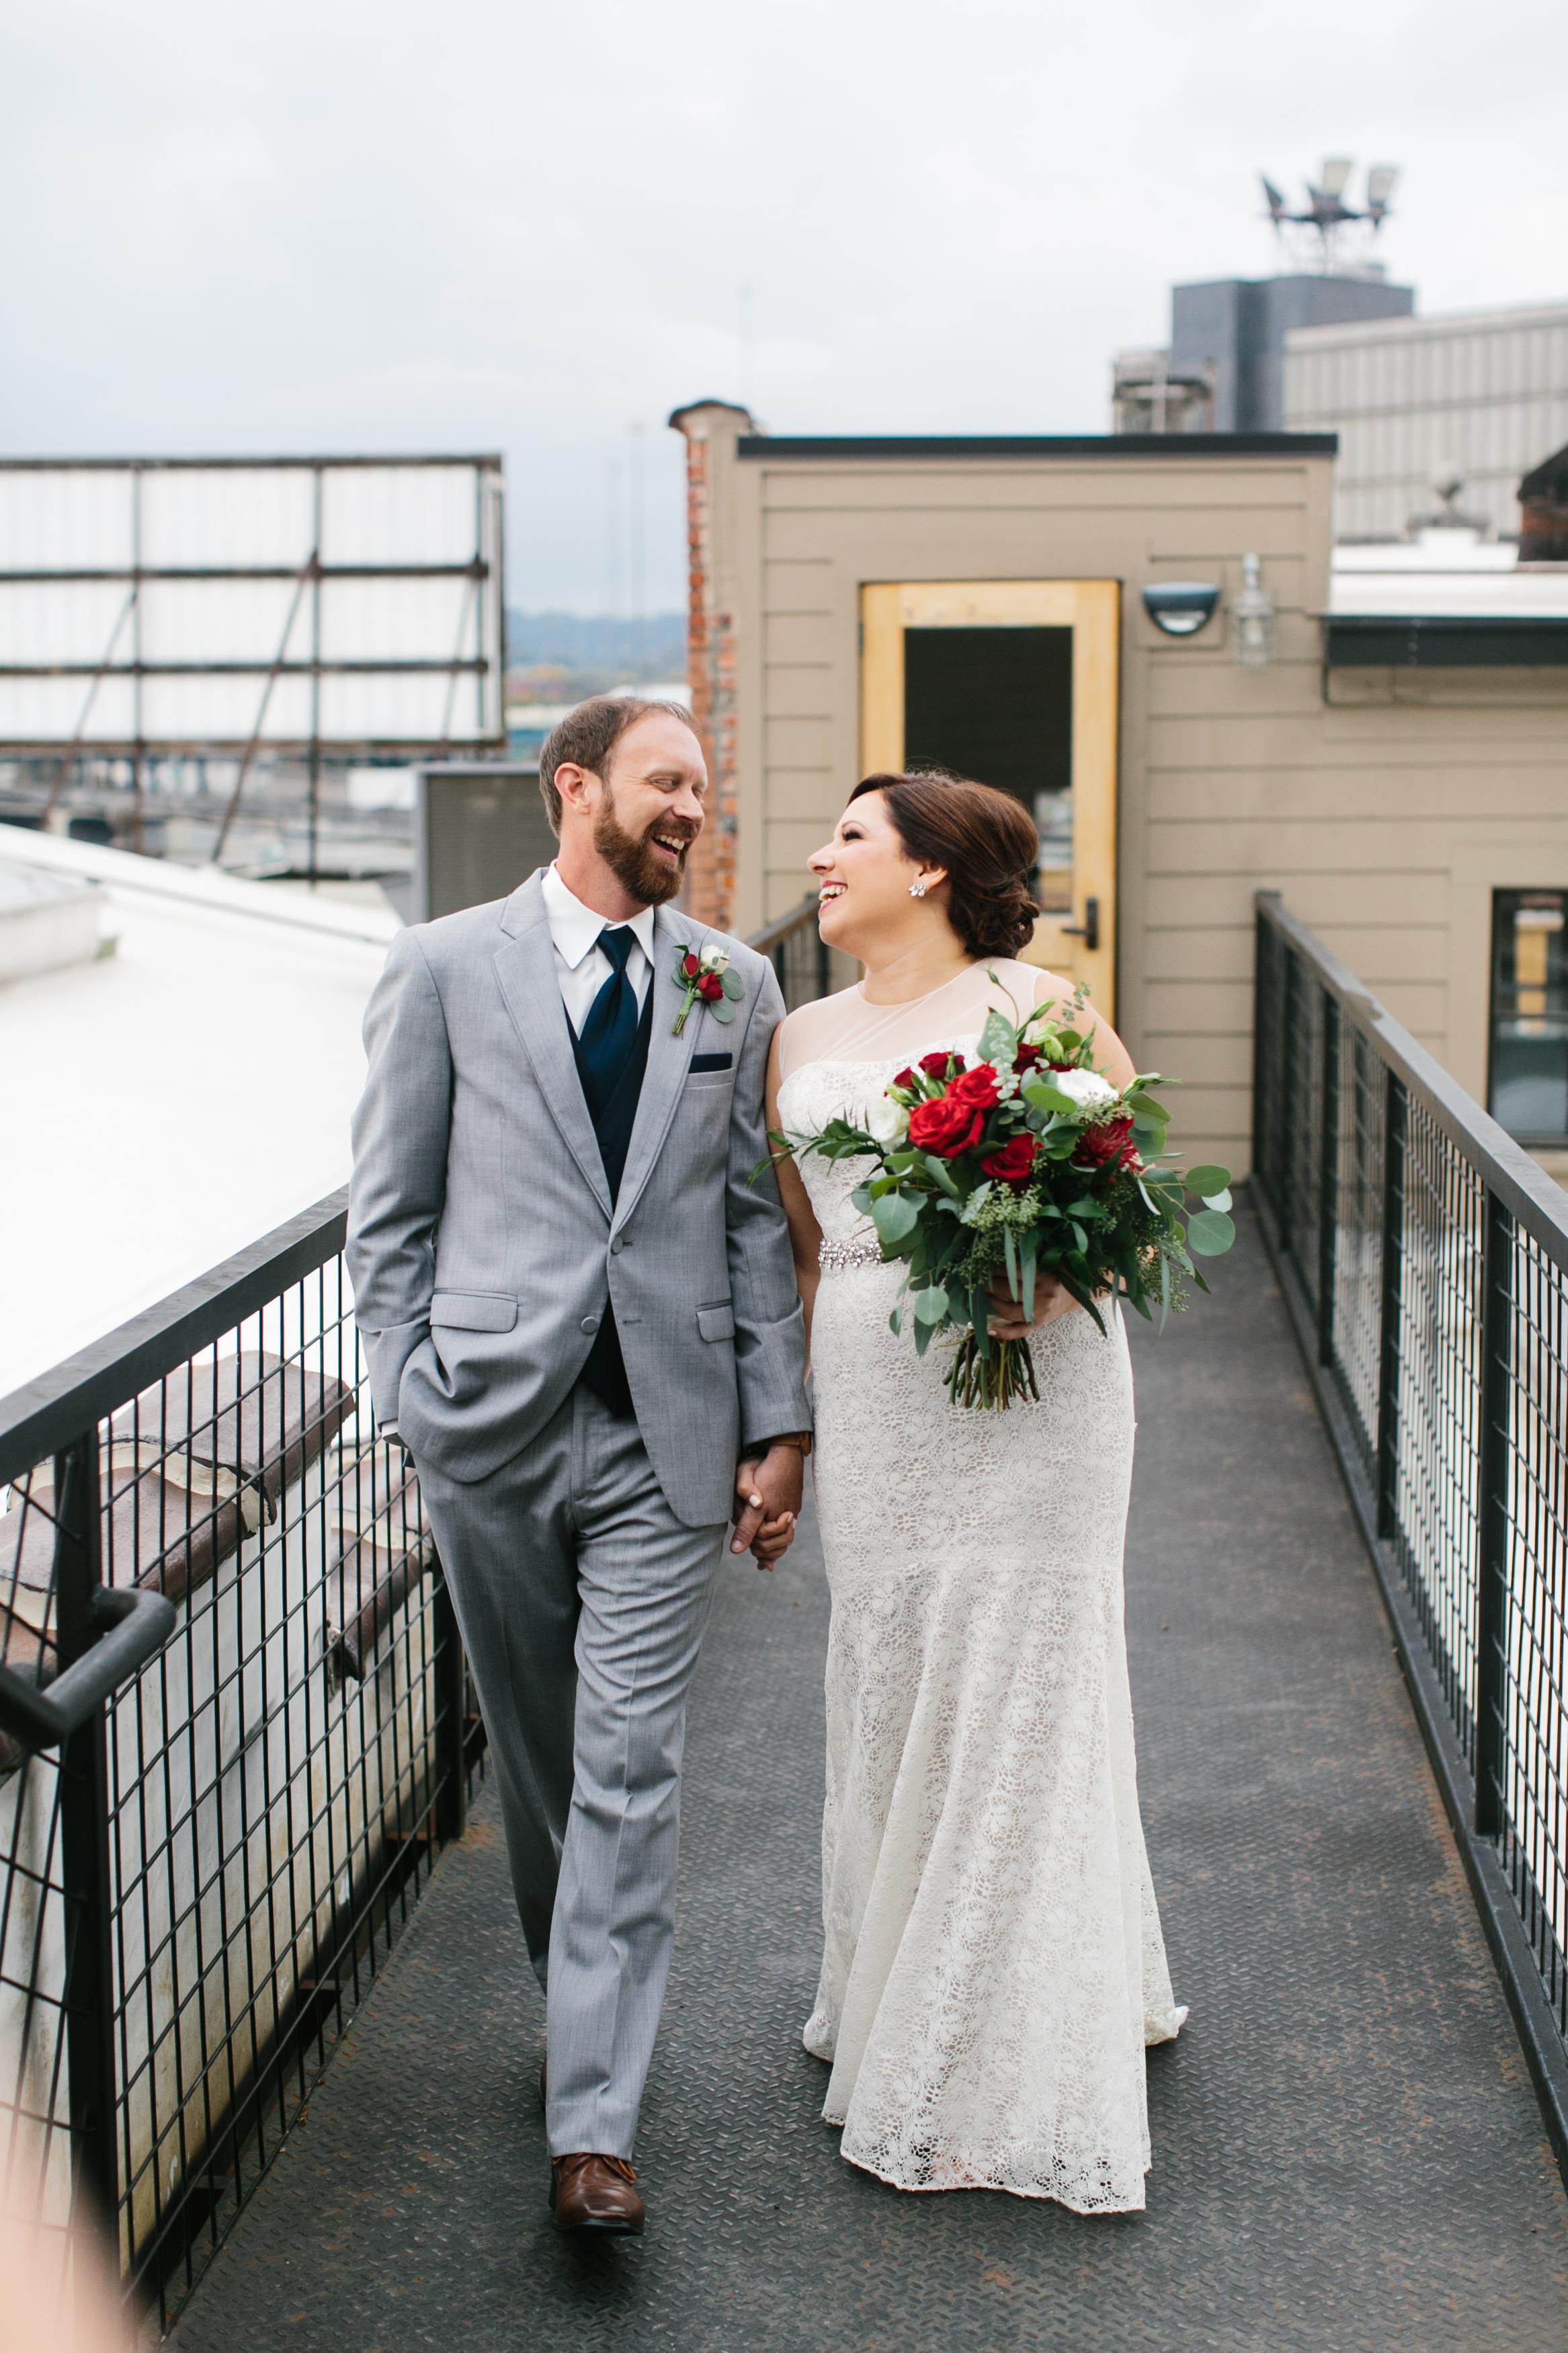 Jessica_Bryan_Wedding_Standard_Knoxville_Abigail_Malone_Photography-305.jpg